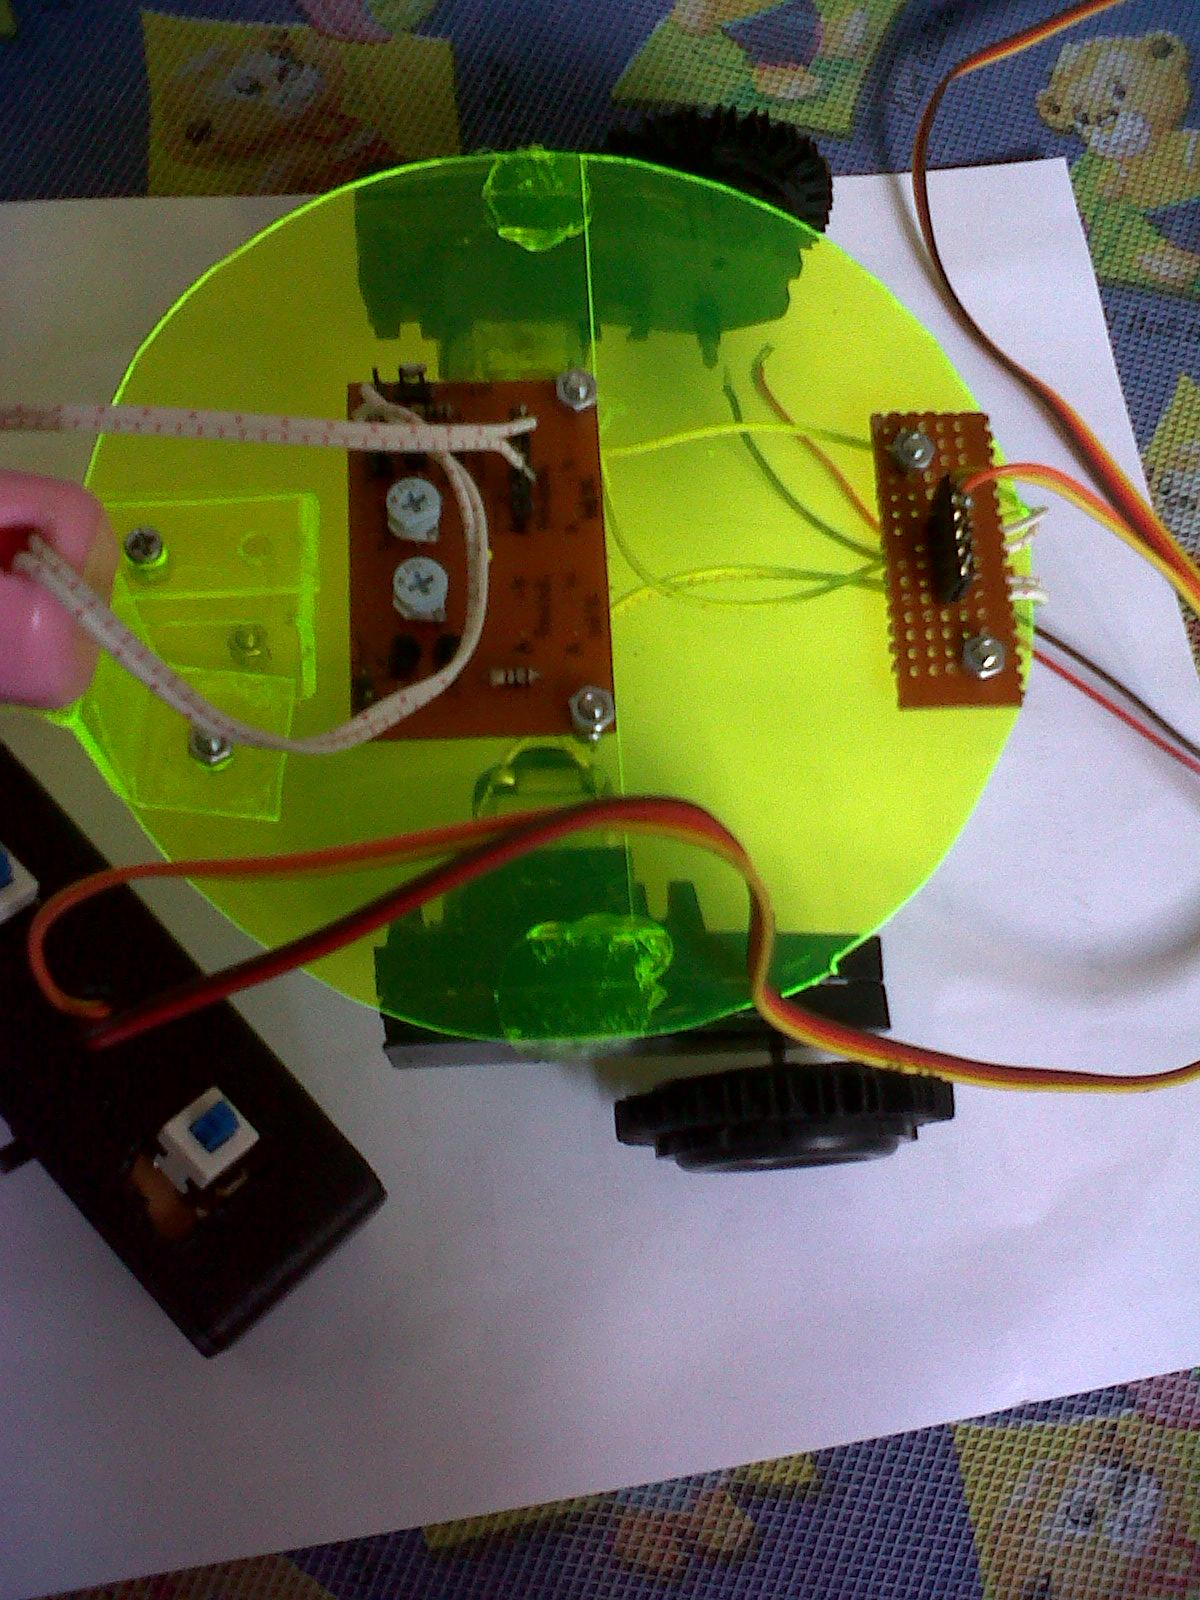 Robot pemadam api elektronika dalam fisika